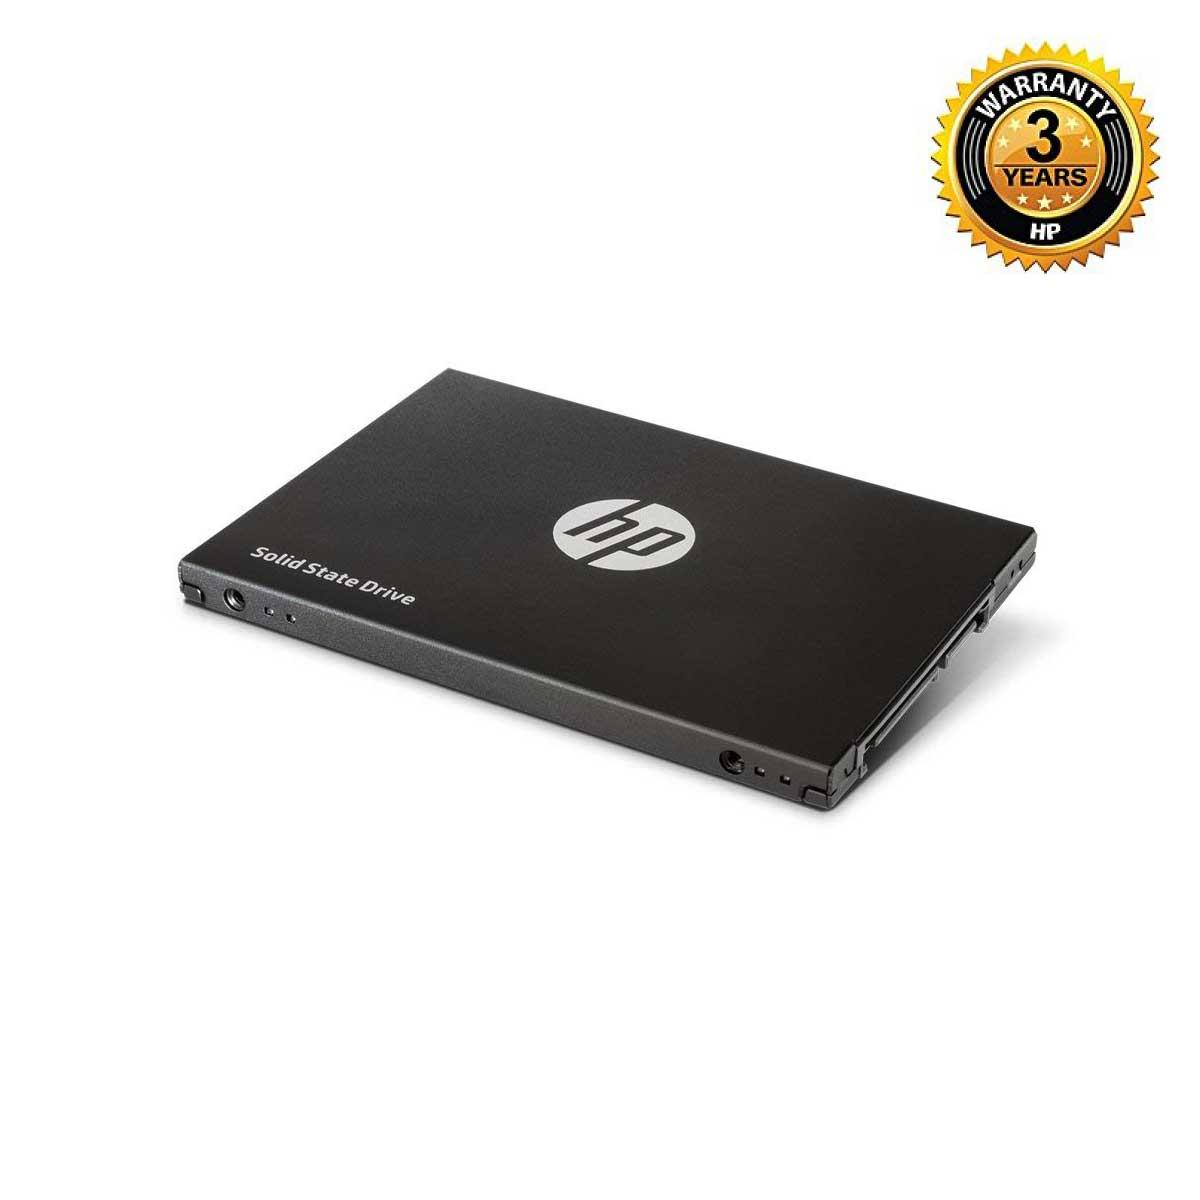 Ssd Price In Bangladesh Buy Hard Disk Online Hardisk Internal Hardis Laptop Samsung 850 Evo 25 Inch Sata 250gb S700 Iii 3d Nand Solid State Drive 500gb Black